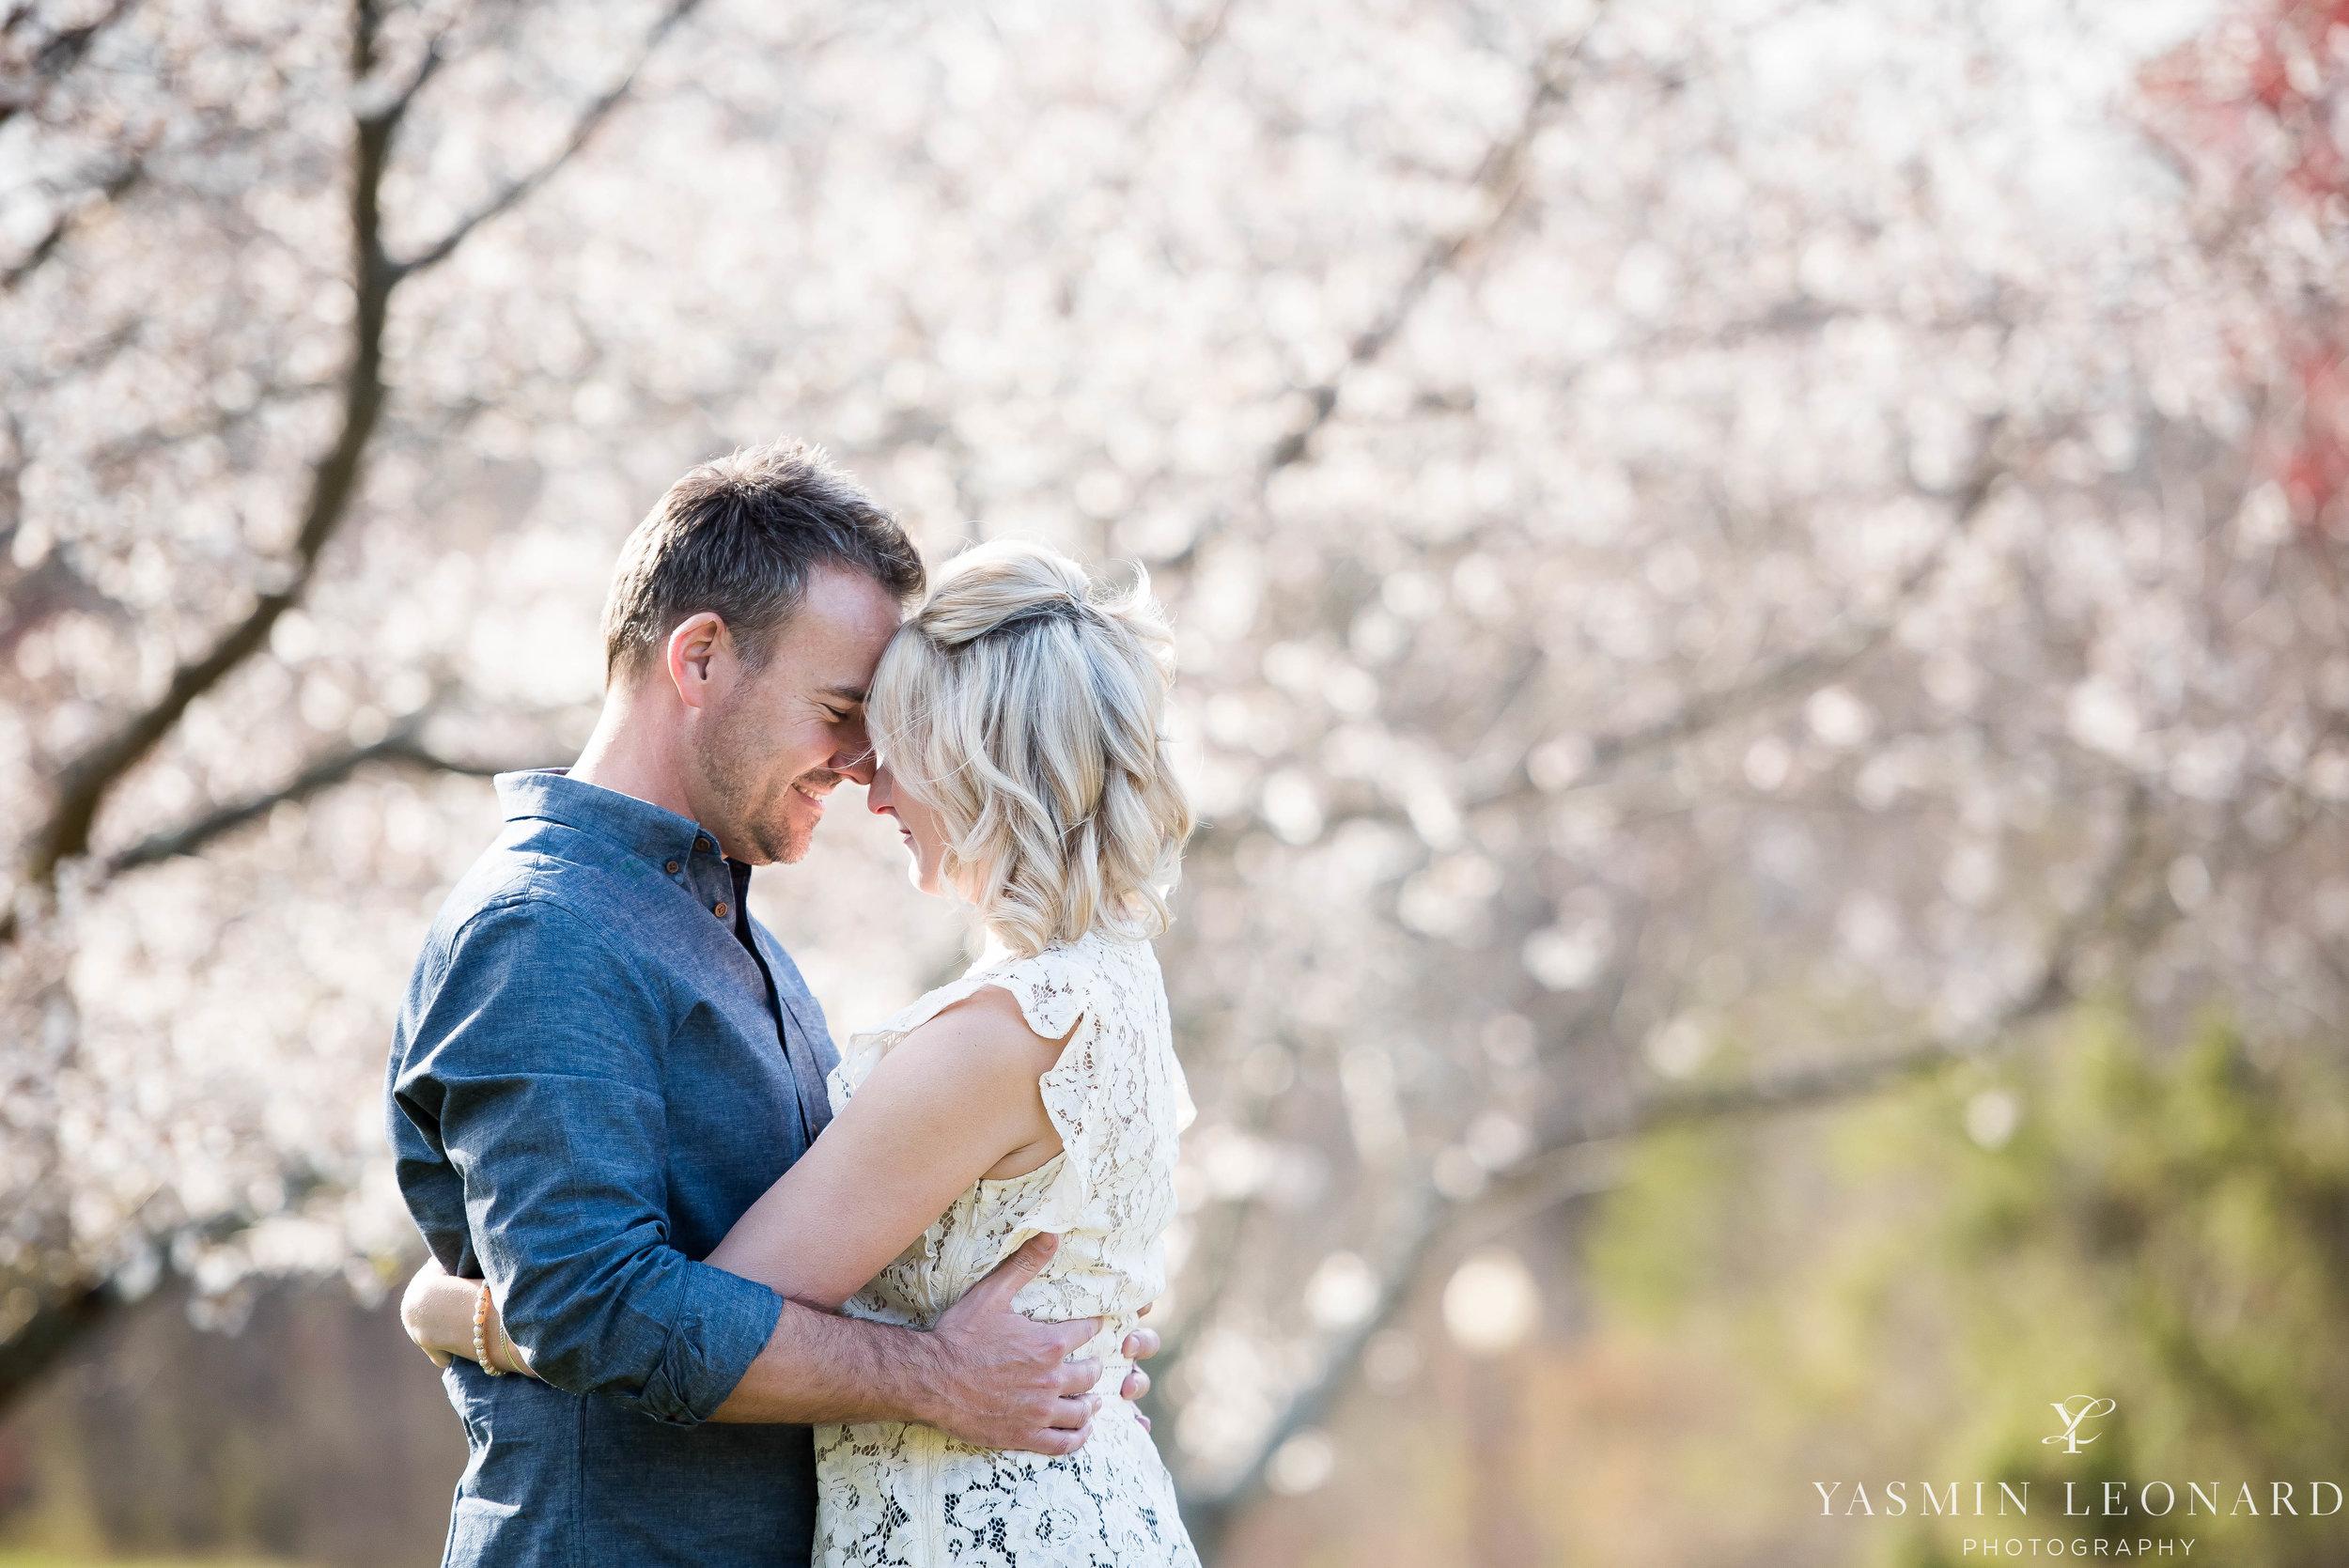 High Point Wedding Photographer - NC Wedding Photographer - Yasmin Leonard Photography - Engagement Poses - Engagement Ideas - Outdoor Engagement Session-6.jpg